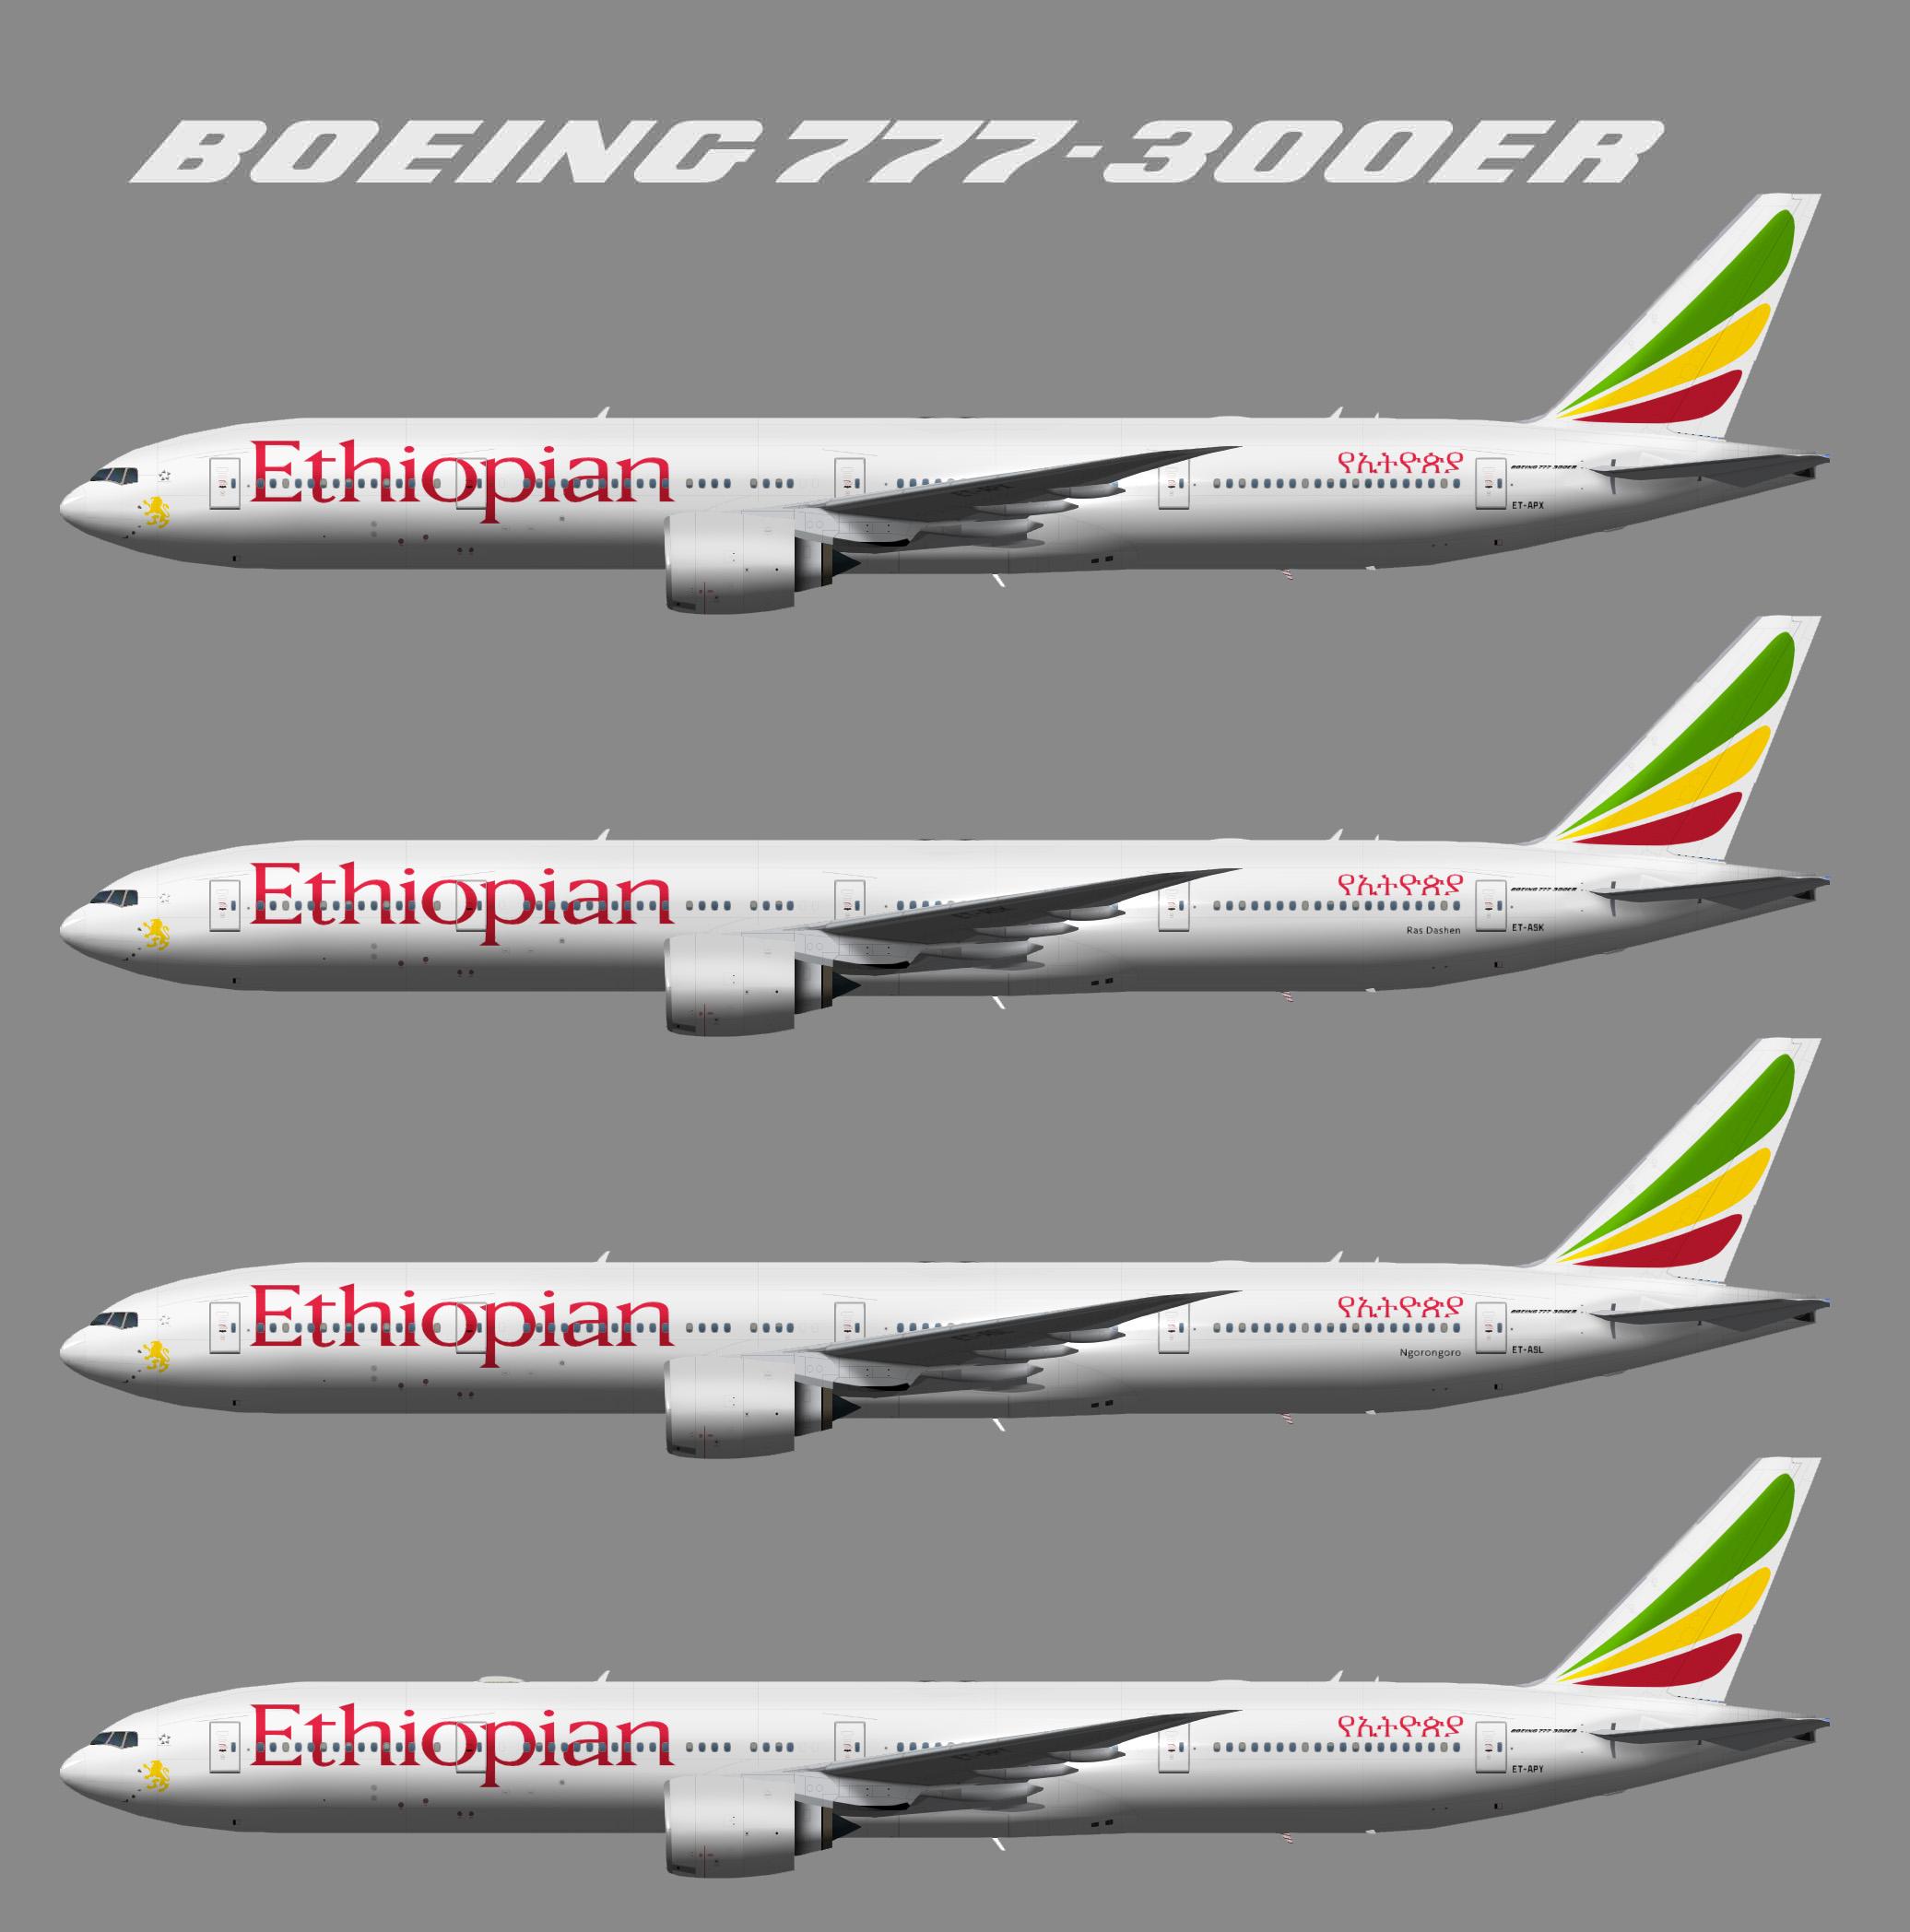 TFS Ethiopian Airlines Boeing 777-300ER